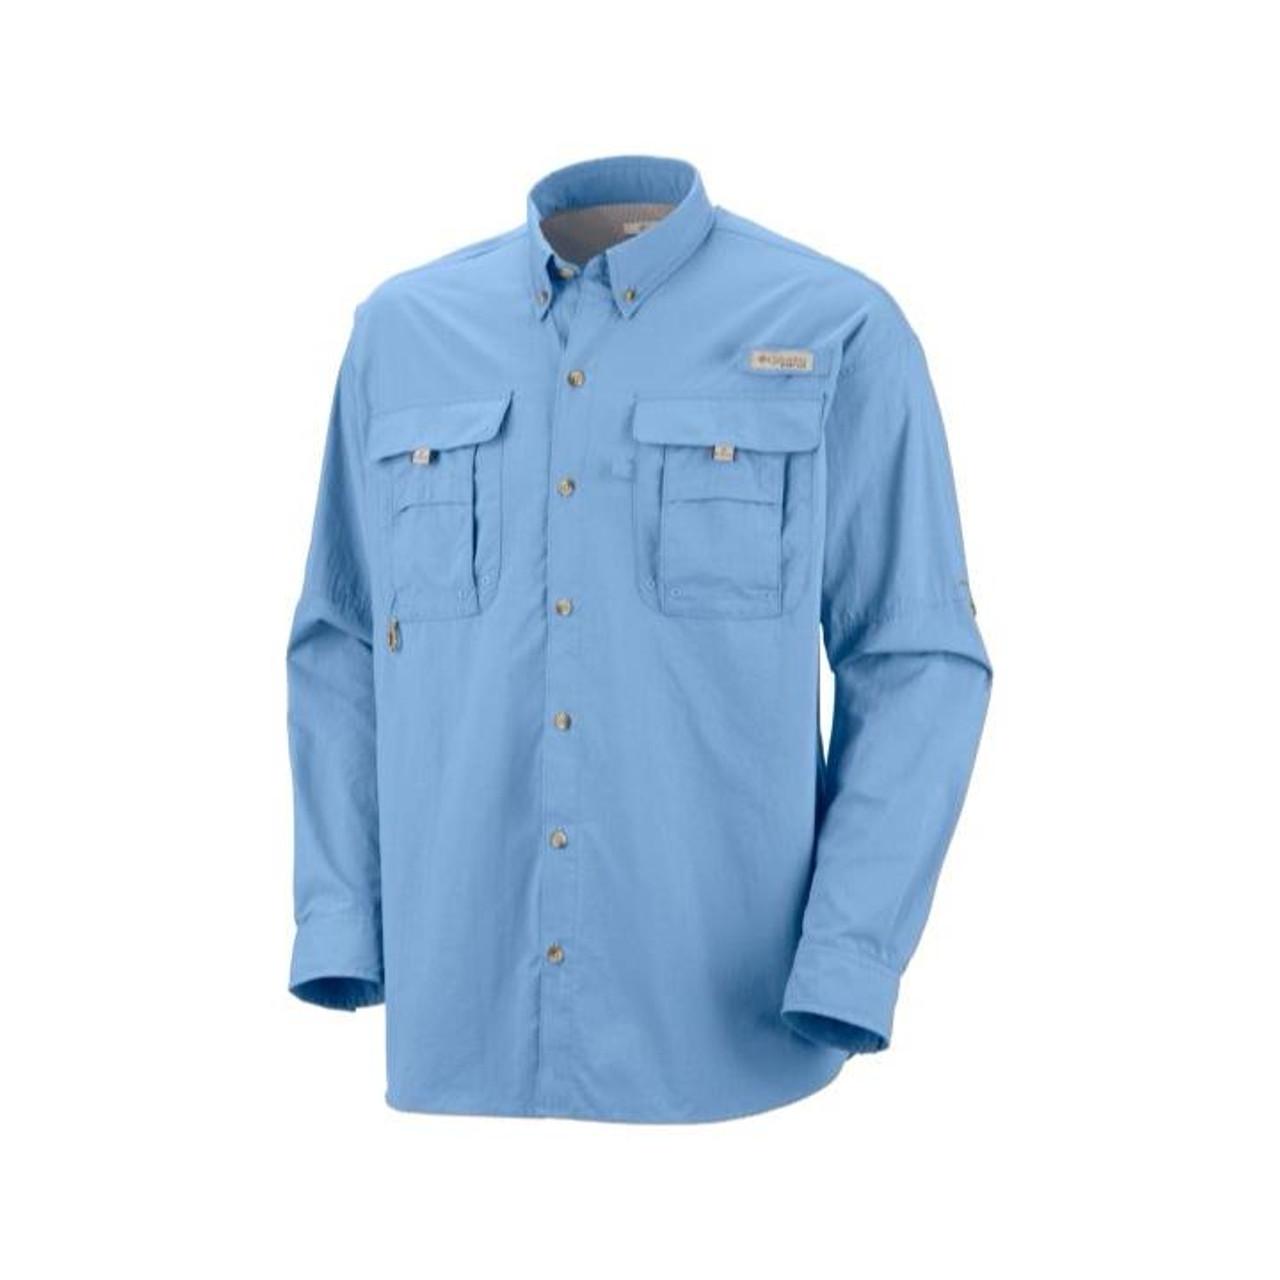 b48448d389e Columbia Men's PFG Bahama II Long Sleeve Shirt - Tall #1011623 -  GameMasters Outdoors